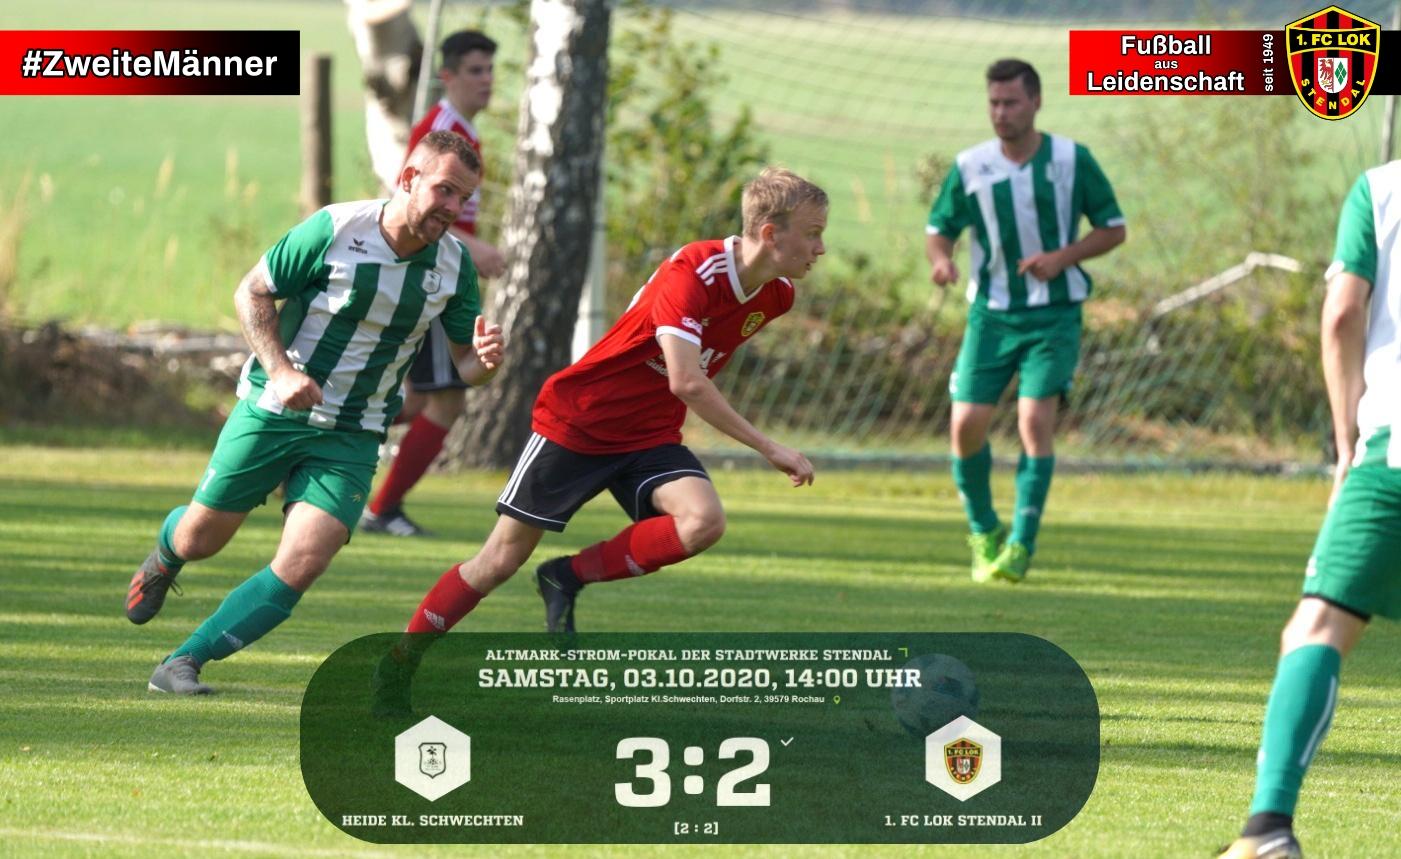 #ZweiteMänner ► Altmark-Strom-Pokal - 1. FC Lok Stendal